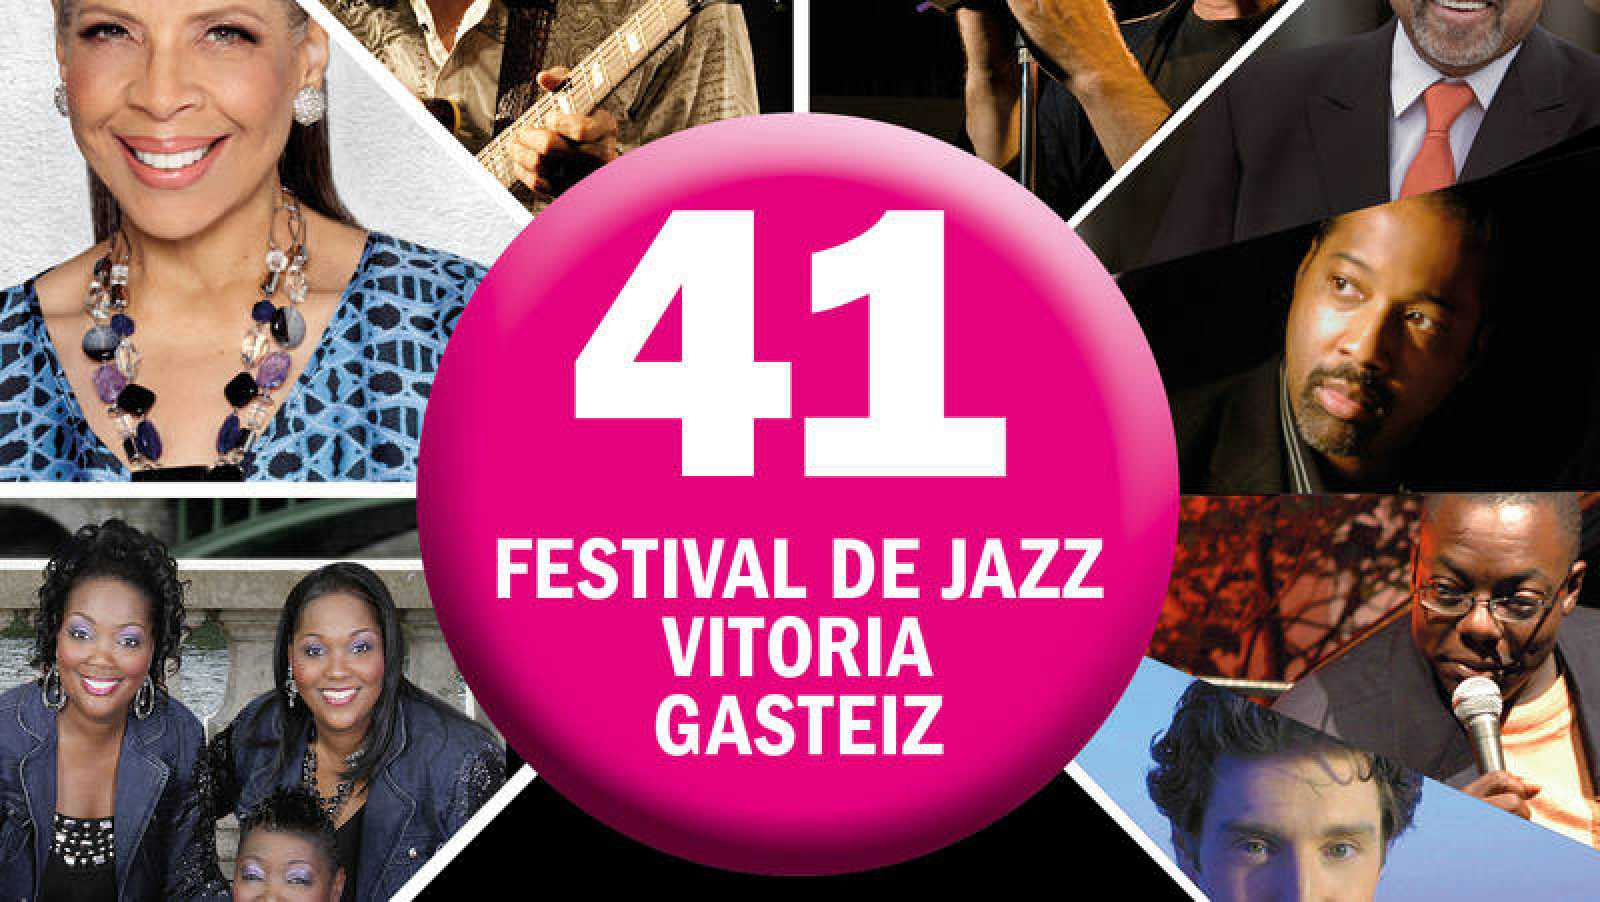 41 Festival de Jazz de Vitoria-Gasteiz